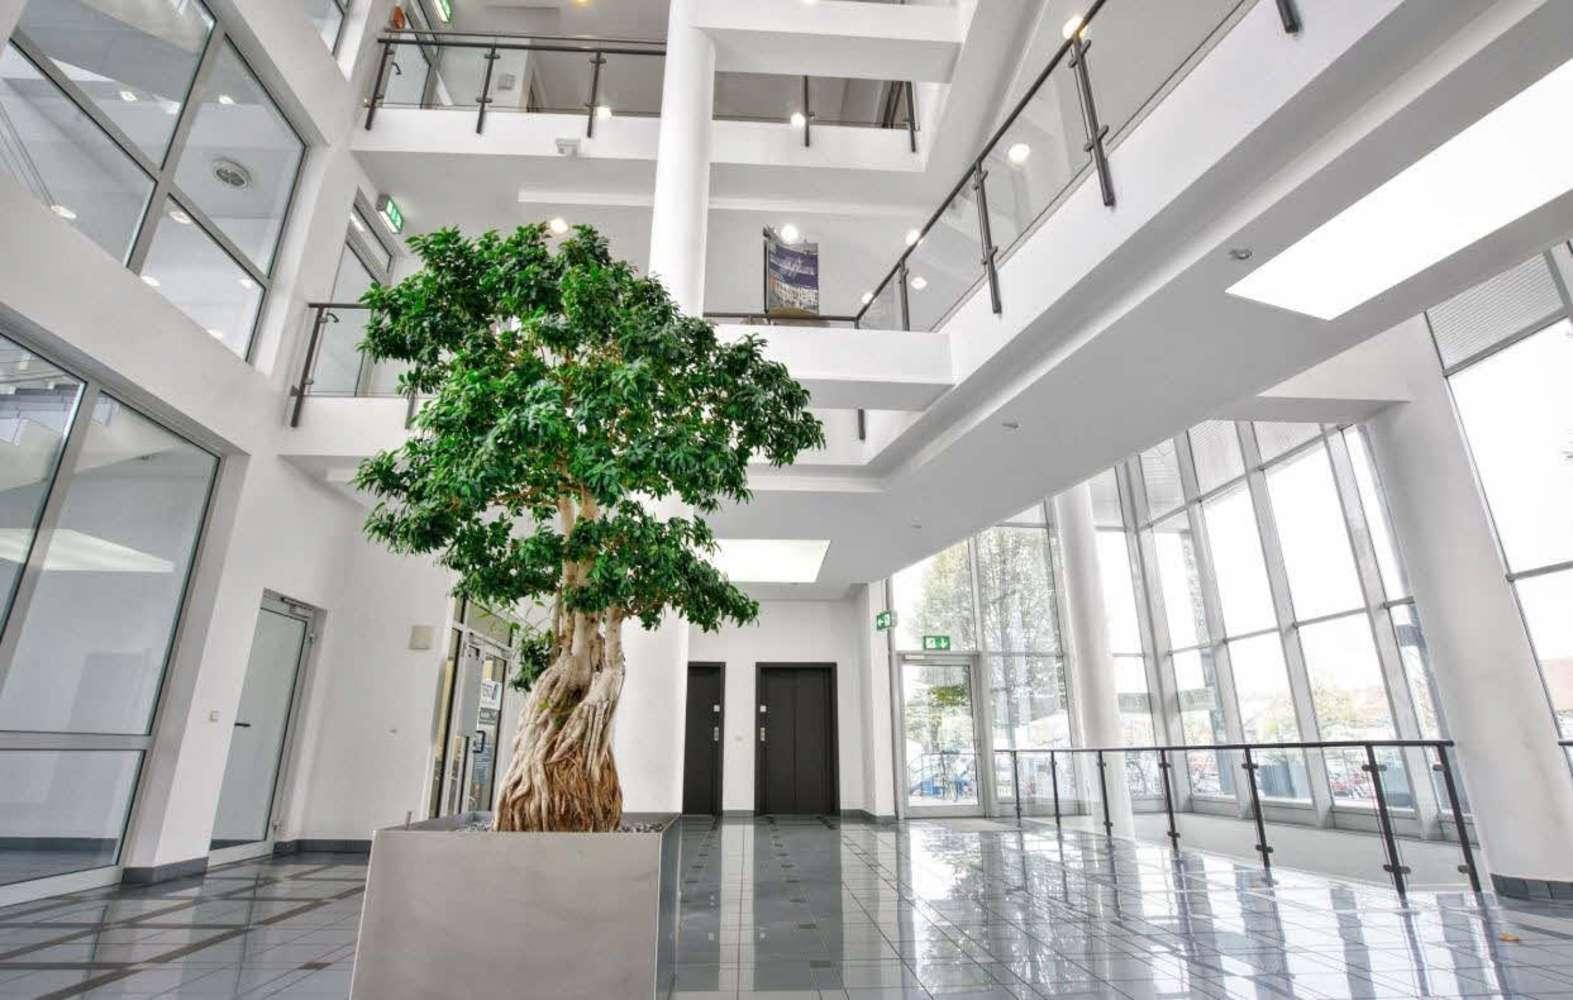 Büros Frankfurt am main, 60388 - Büro - Frankfurt am Main, Bergen-Enkheim - F1306 - 10008318